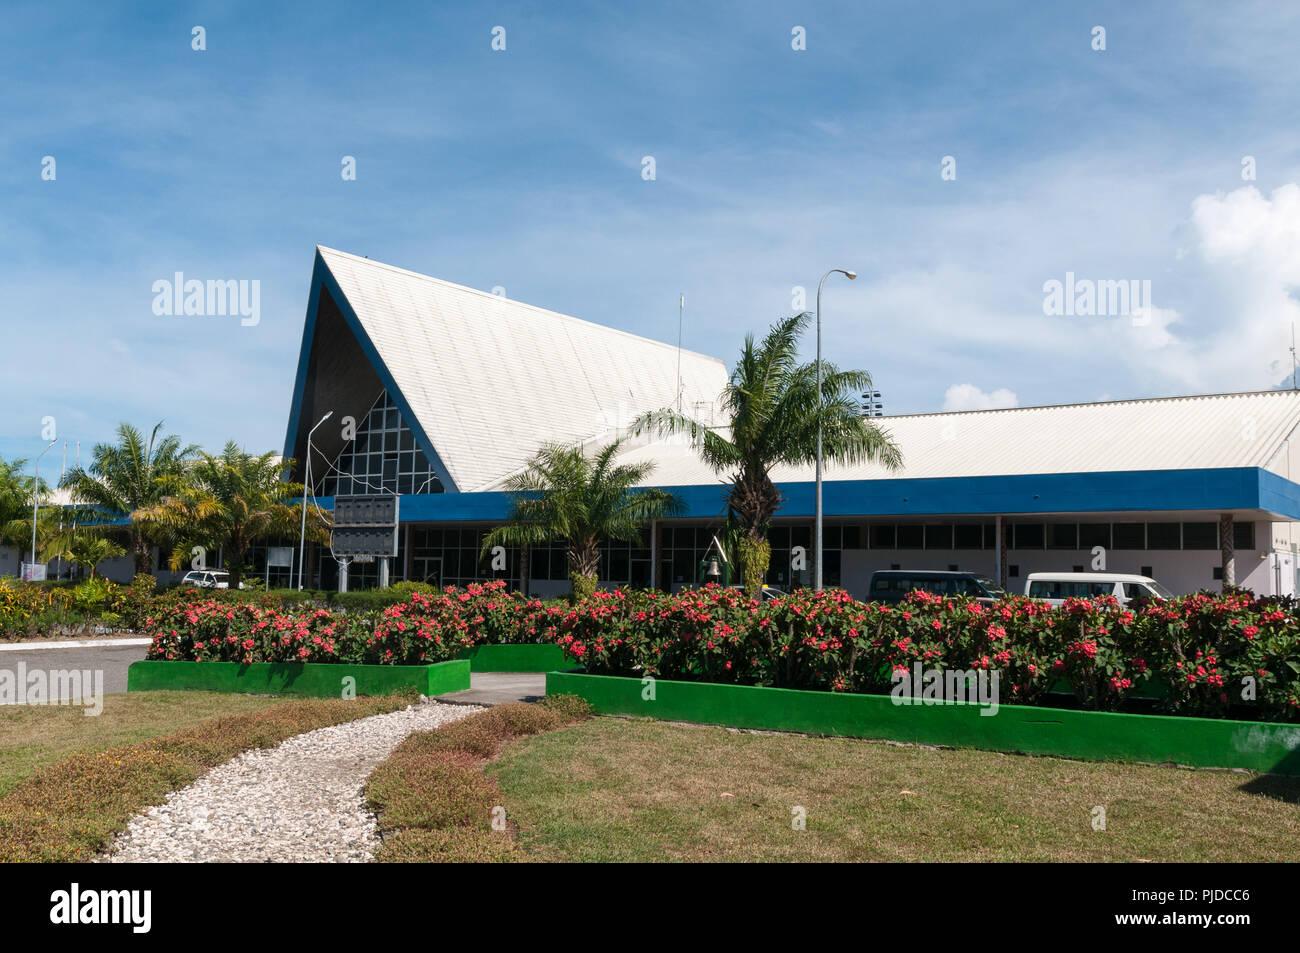 Honiara International Airport, Henderson Field, Honiara, Guadalcanal, Solomon Islands - Stock Image